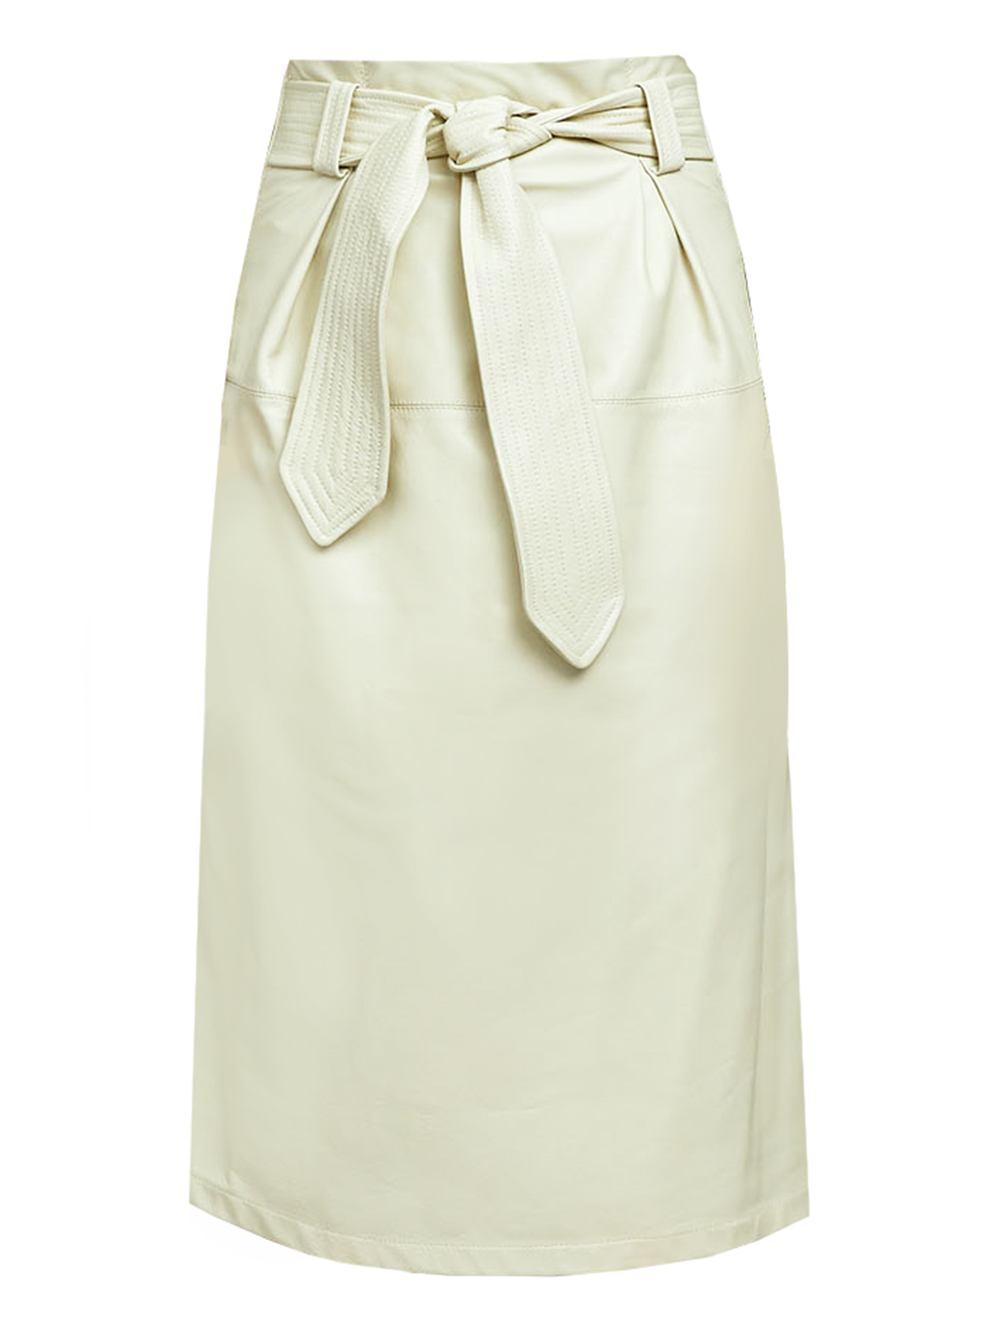 Paola Tie Waist Vegan Leather Skirt Item # CLS05